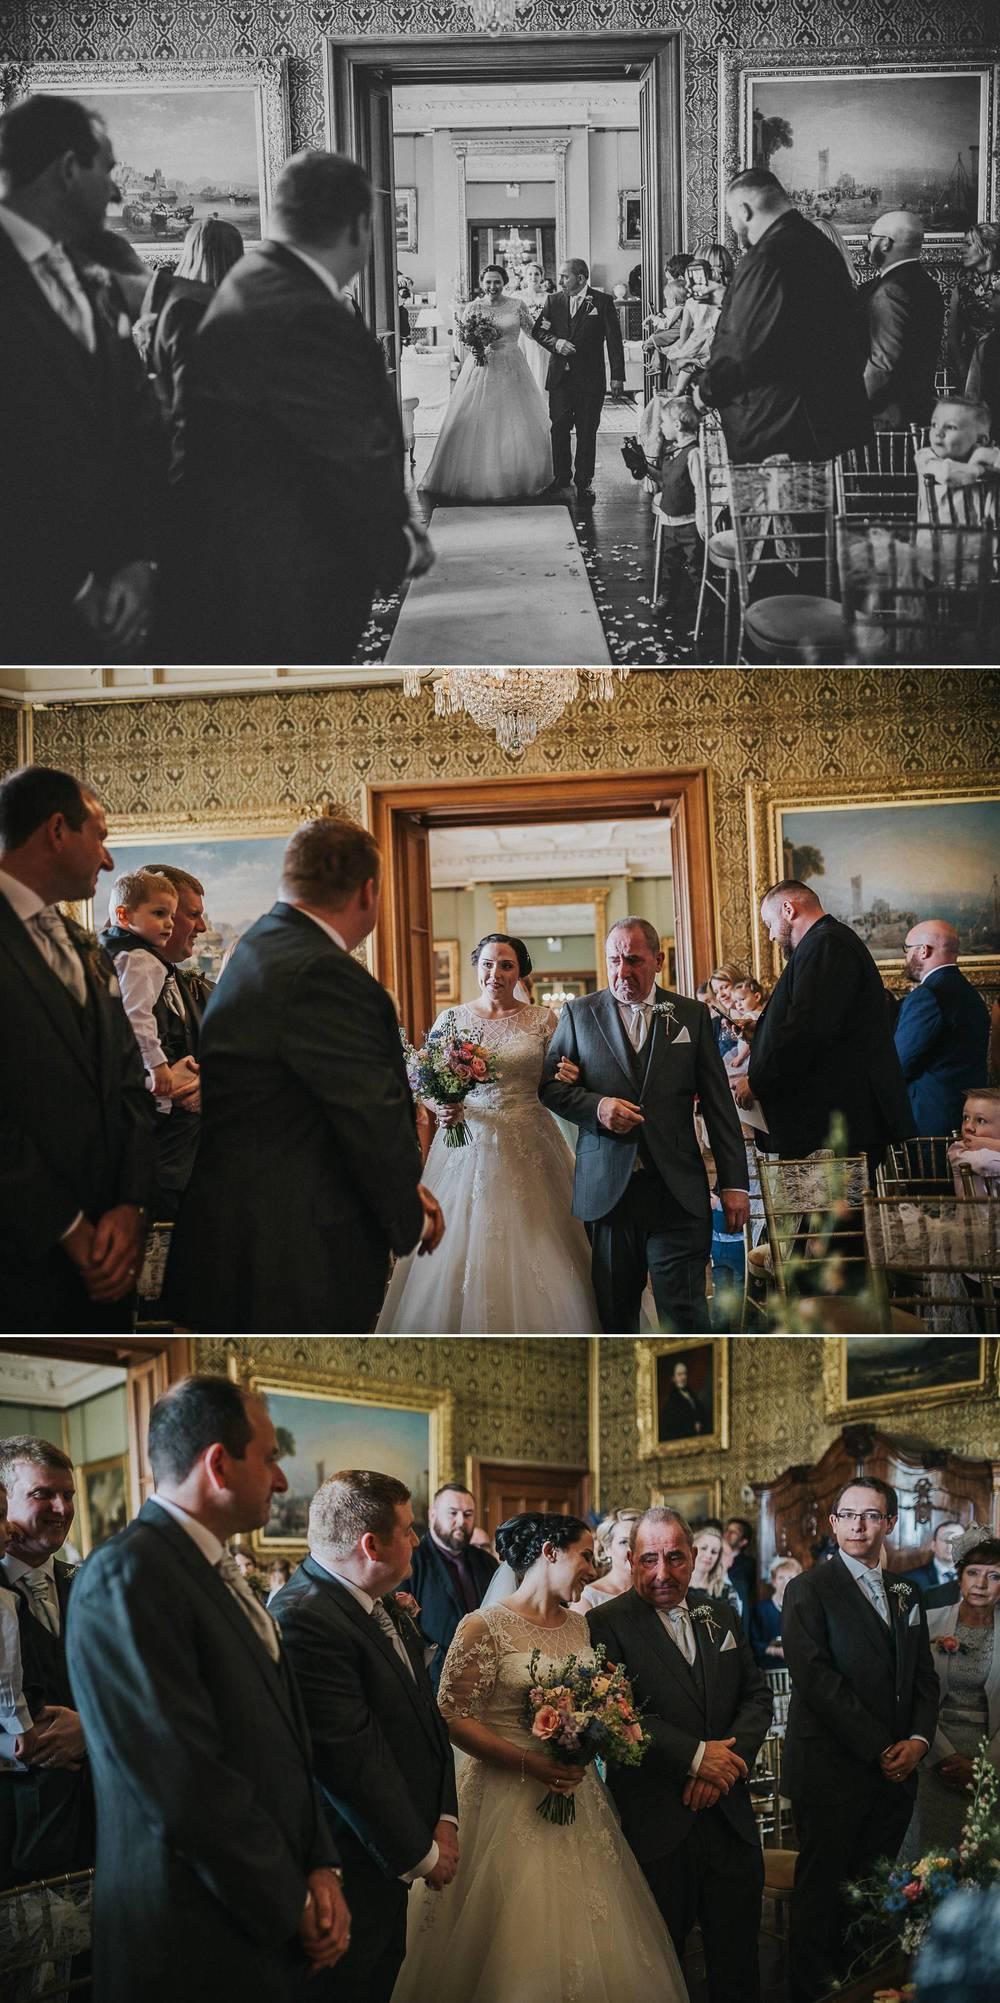 wedding-photographer-staffordshire 10.jpg